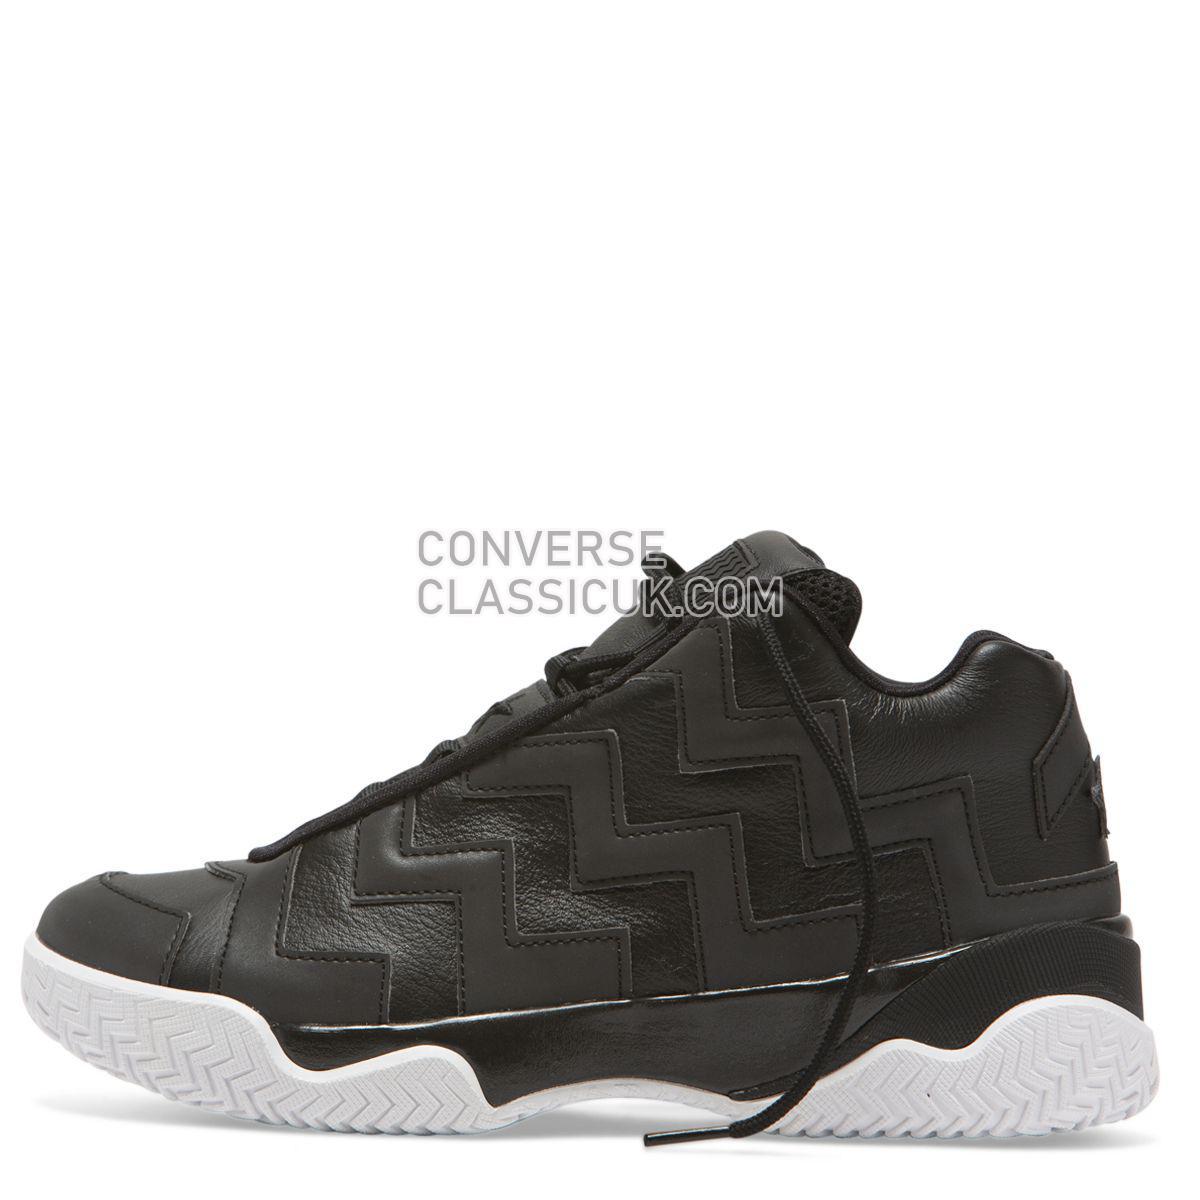 Converse Chuck Taylor All Star VLTG Mission-V Mid Black Mono Womens 565063 Black/Black/Black Shoes